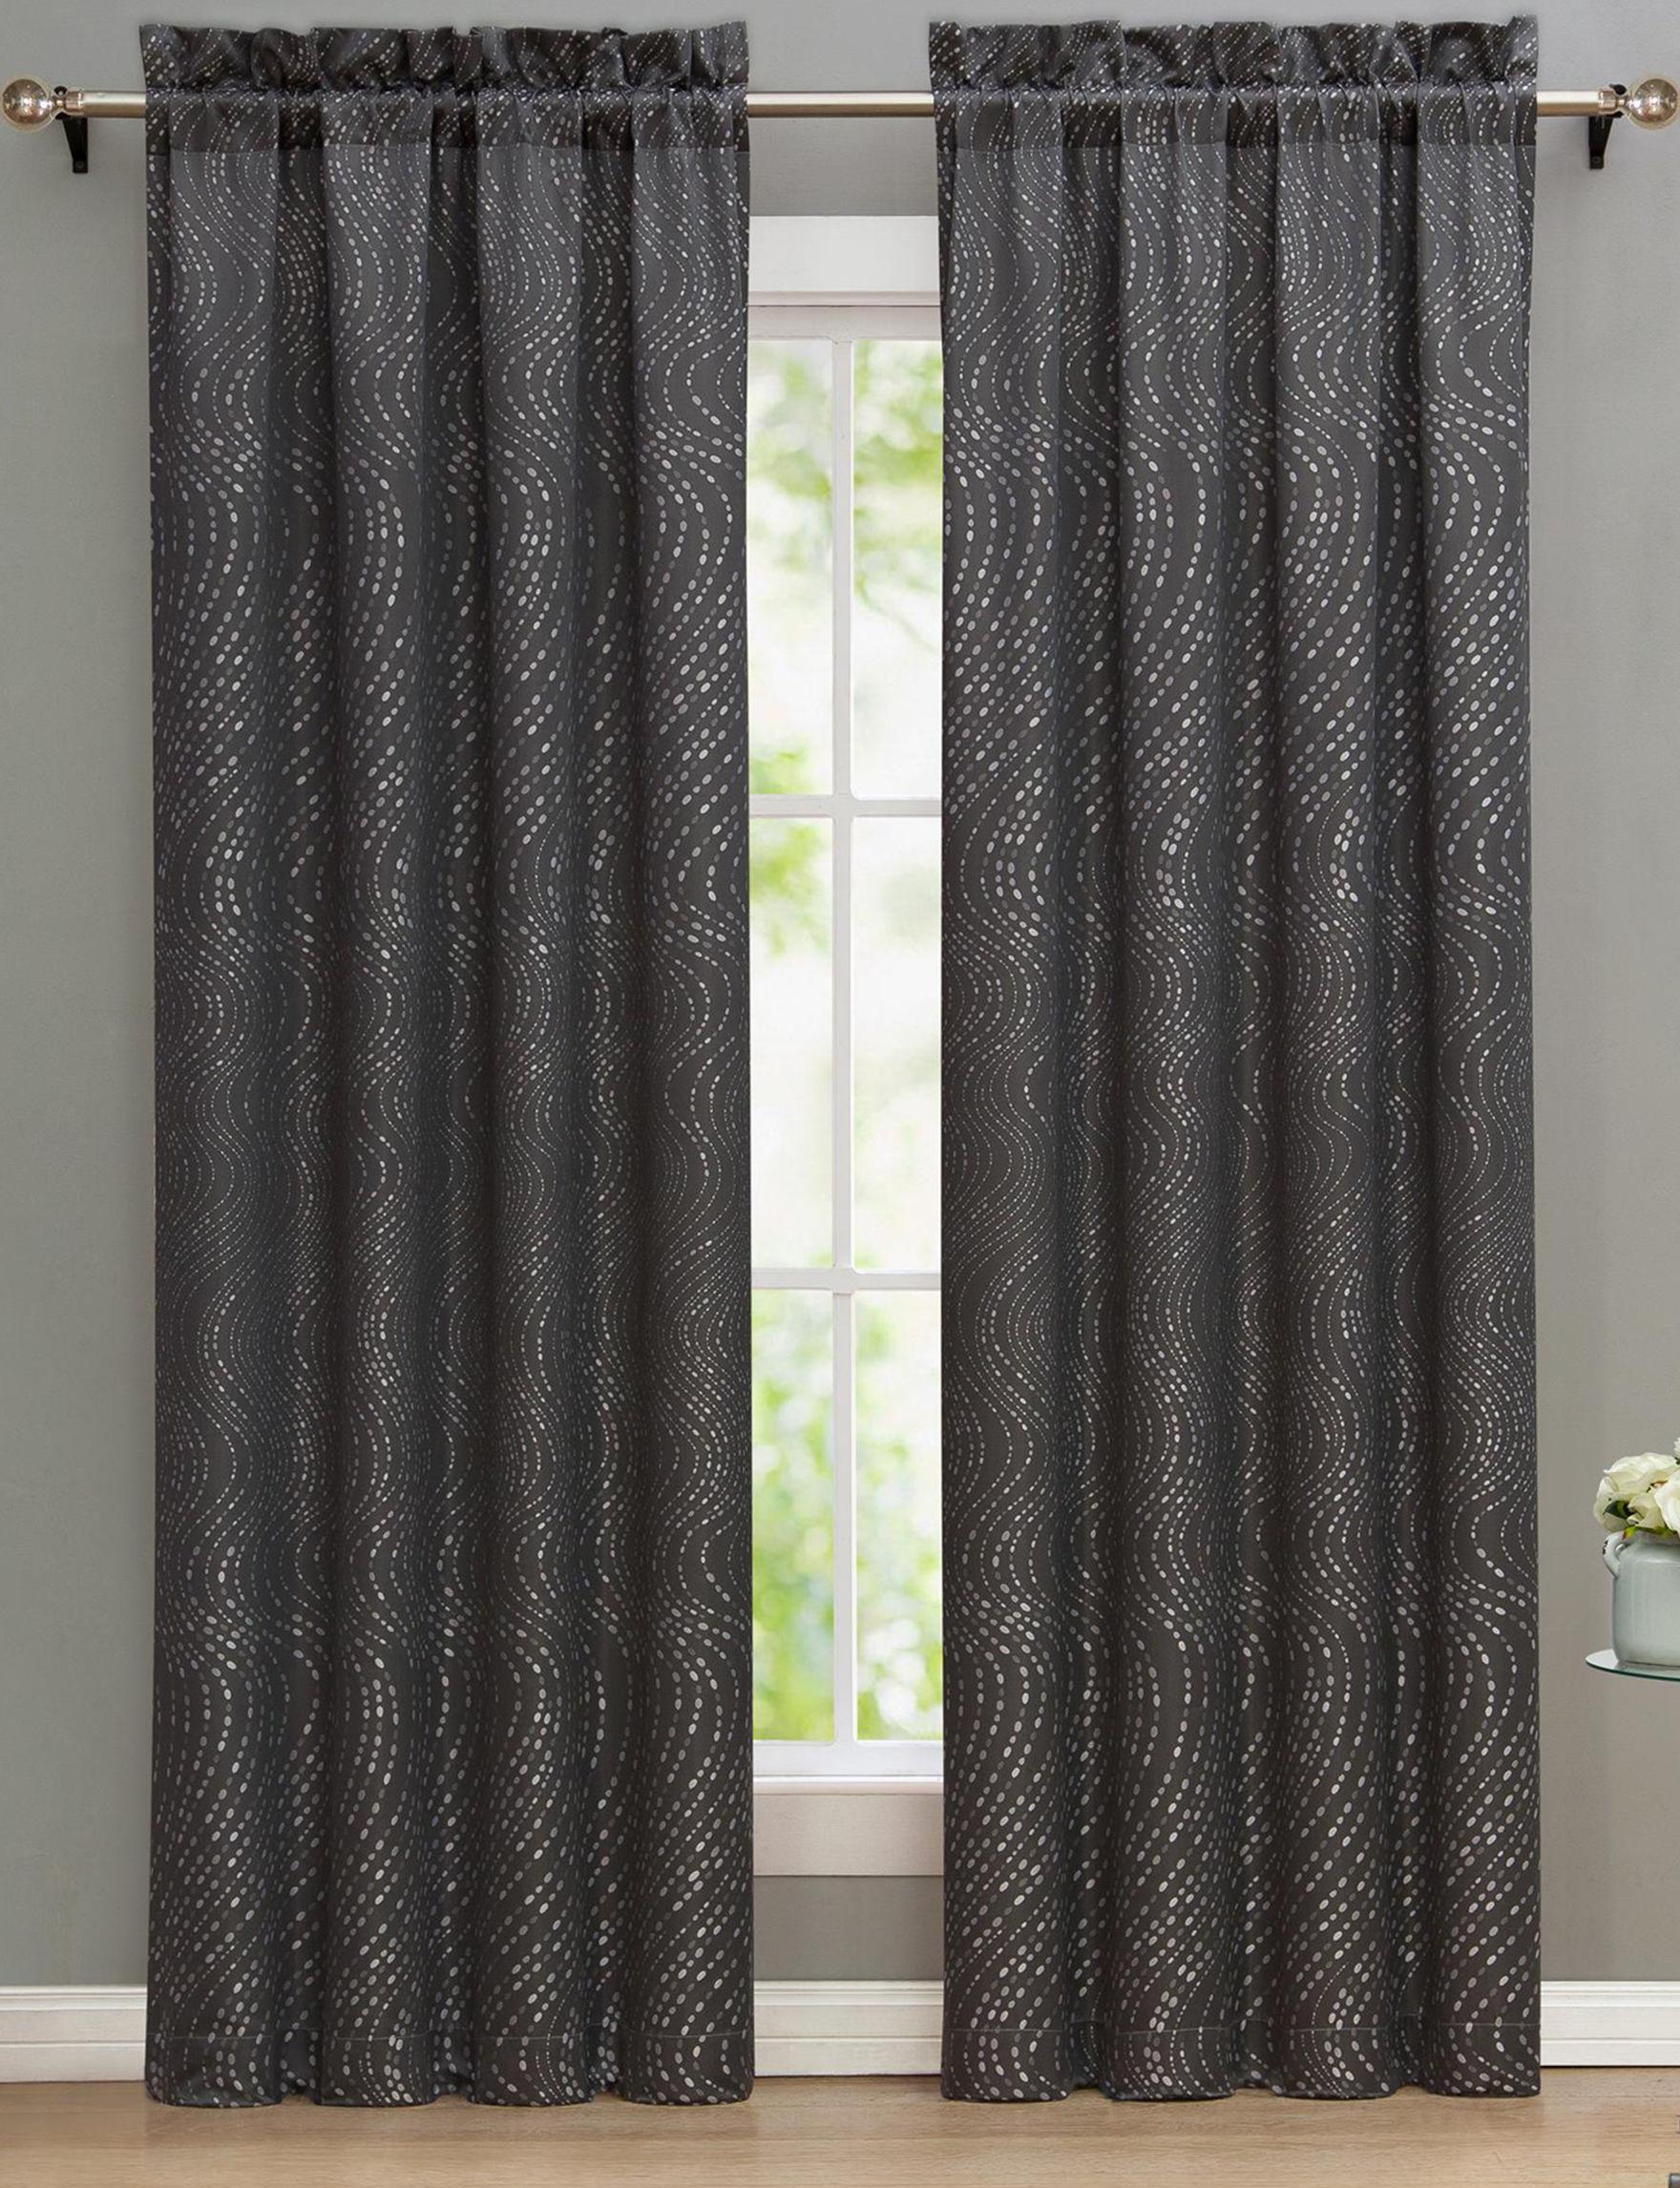 Nikki Chu Grey Curtains & Drapes Window Treatments